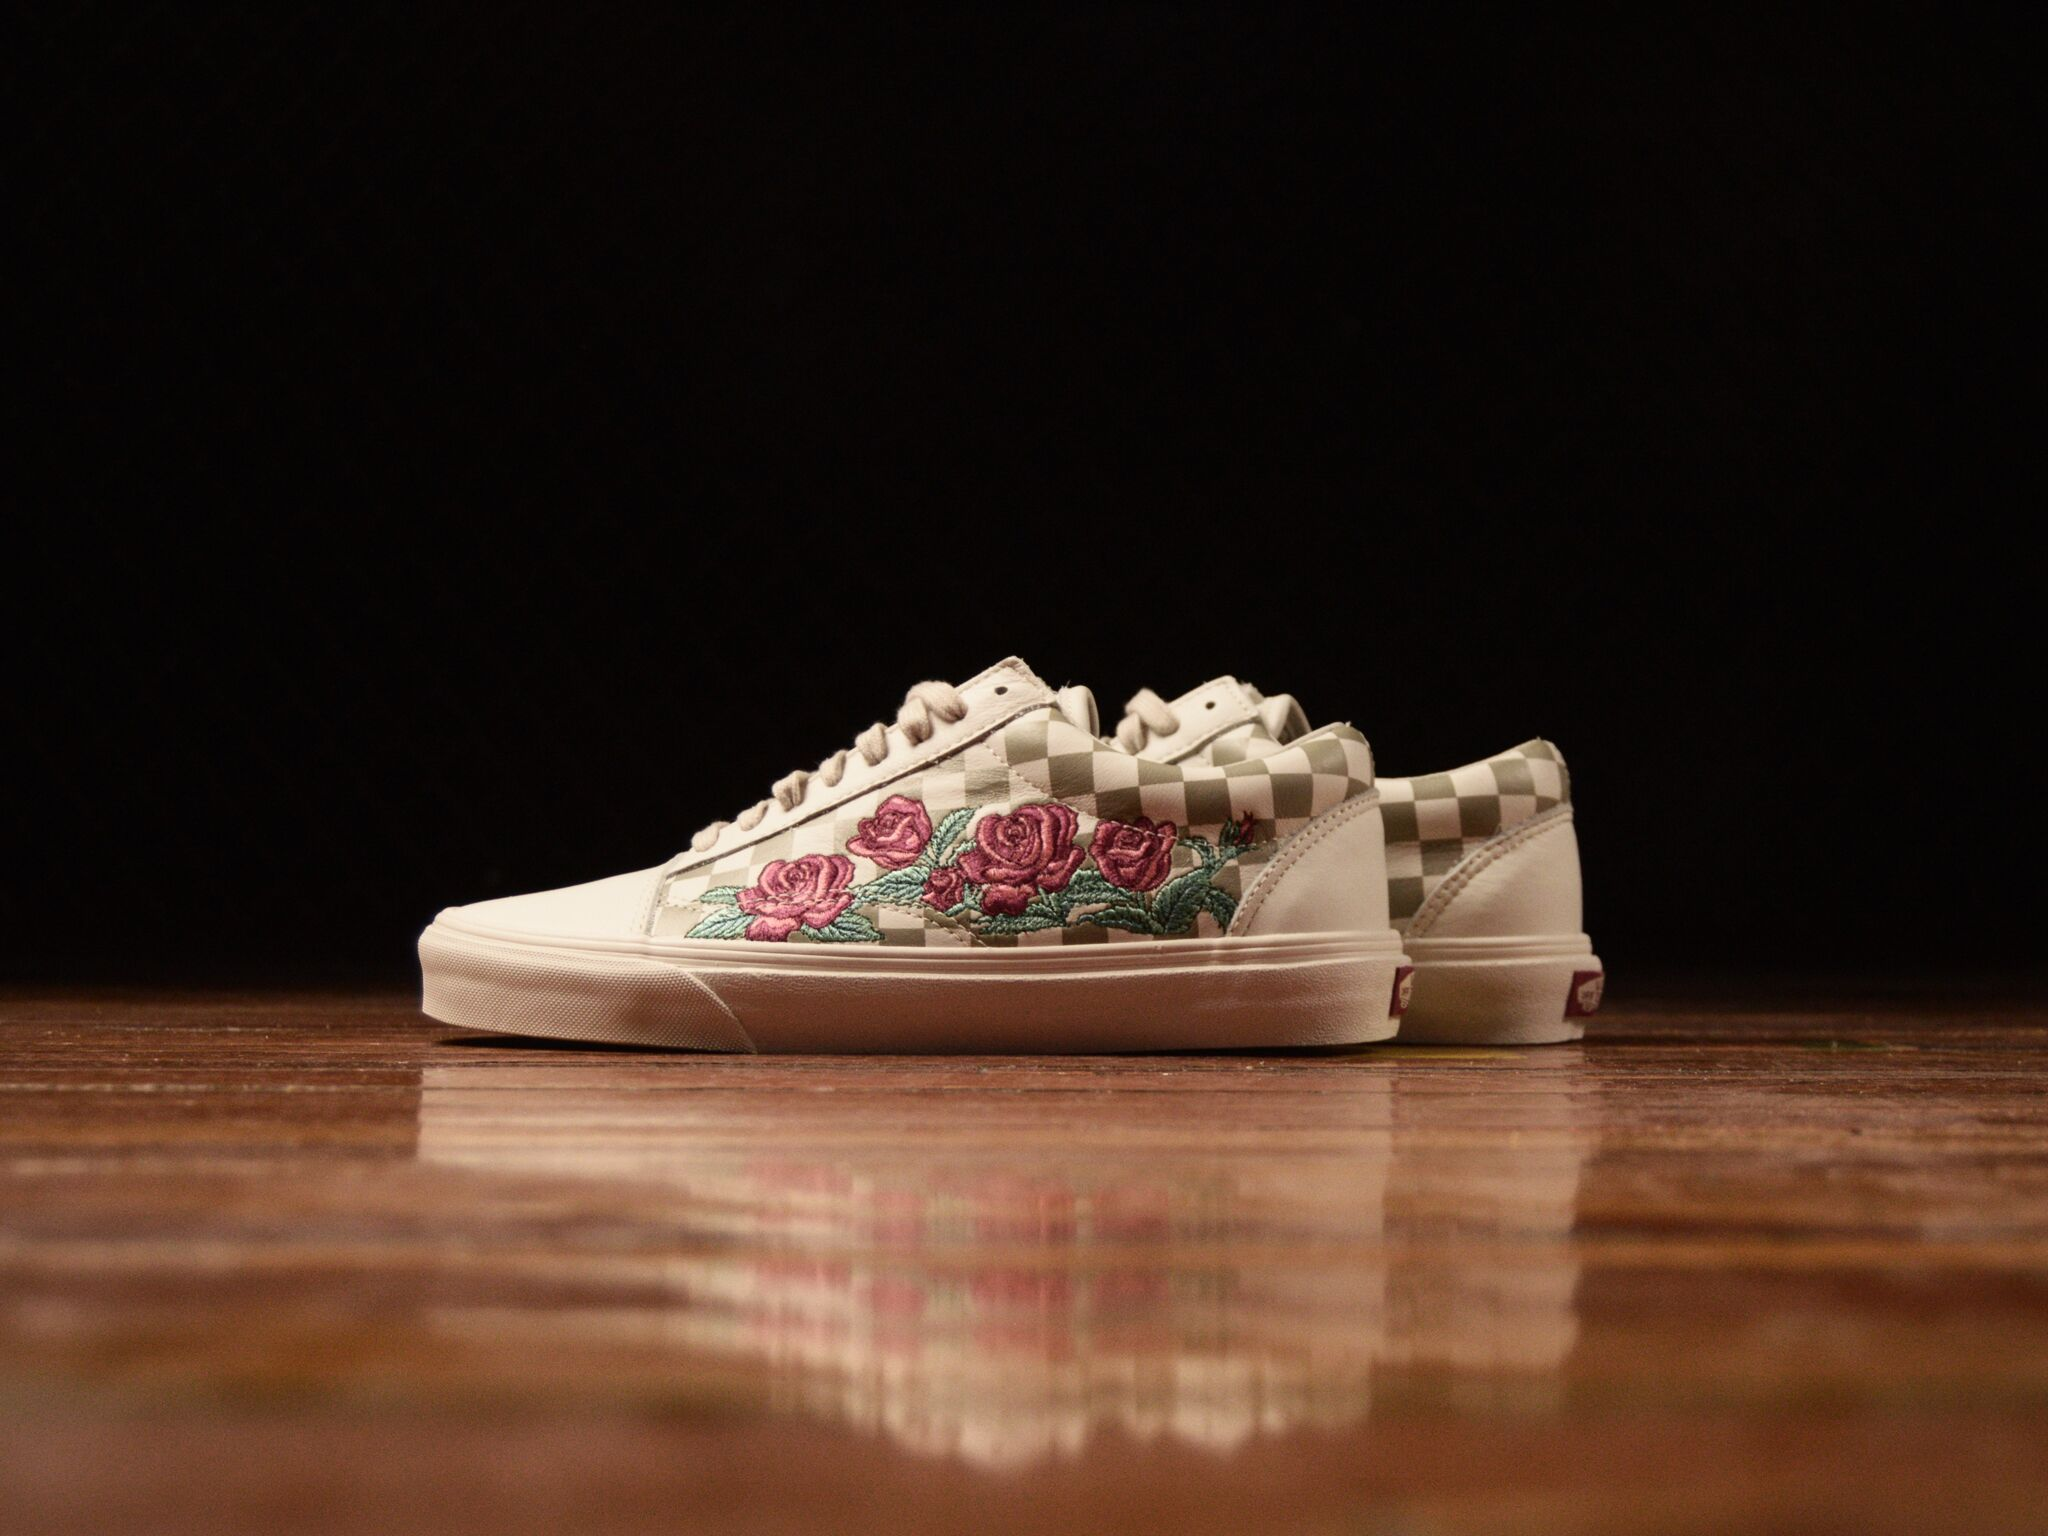 Men S Vans Old Skool Dx Rose Embroidery Vn0a38g3qf9 Cloths Cool Vans Shoes Vans Shop Shoes